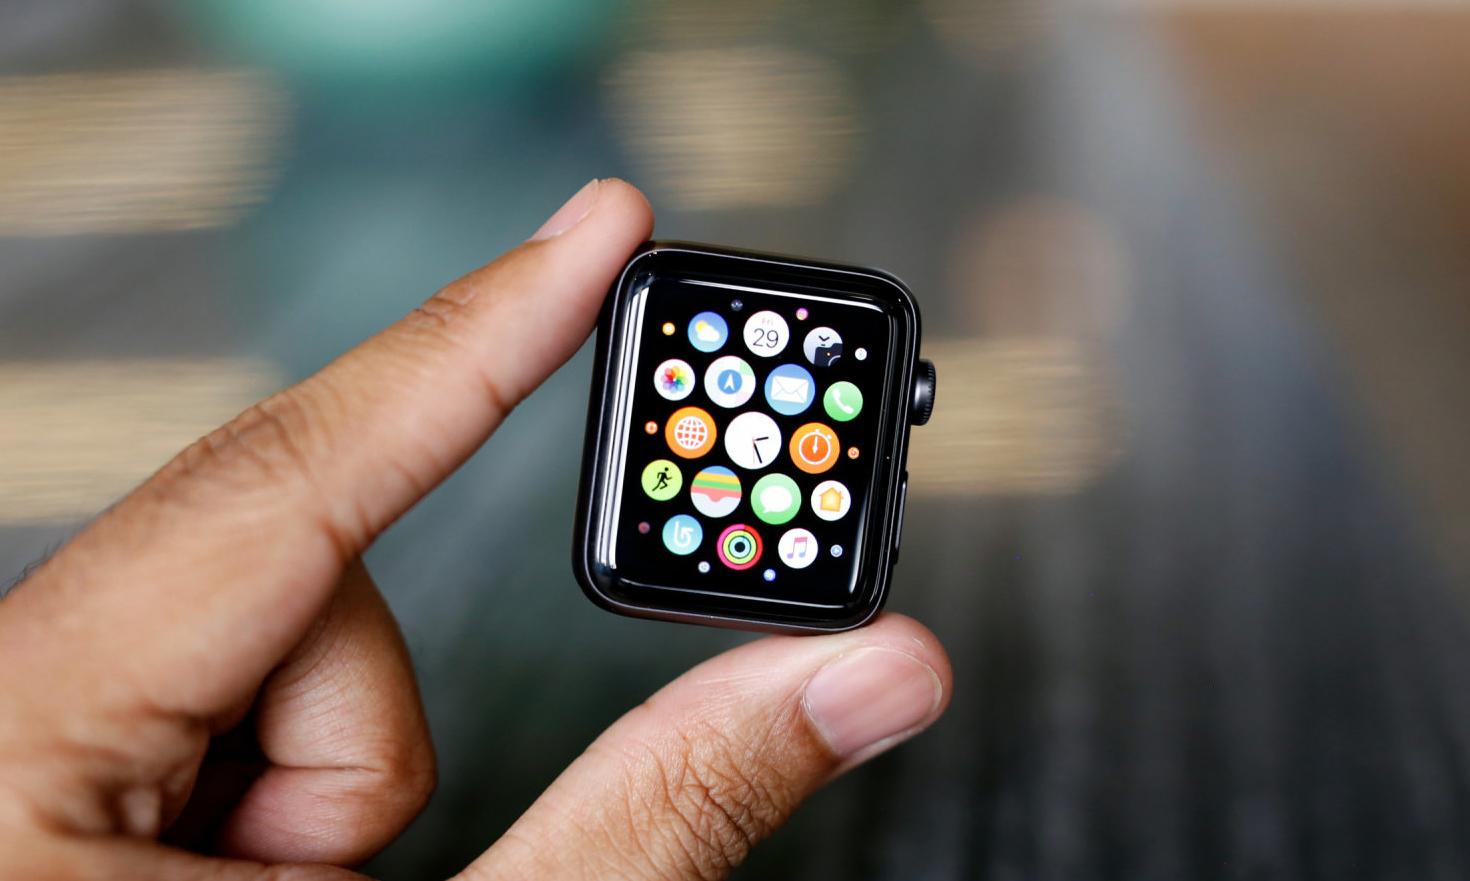 Instagram 打算撤离 Apple Watch